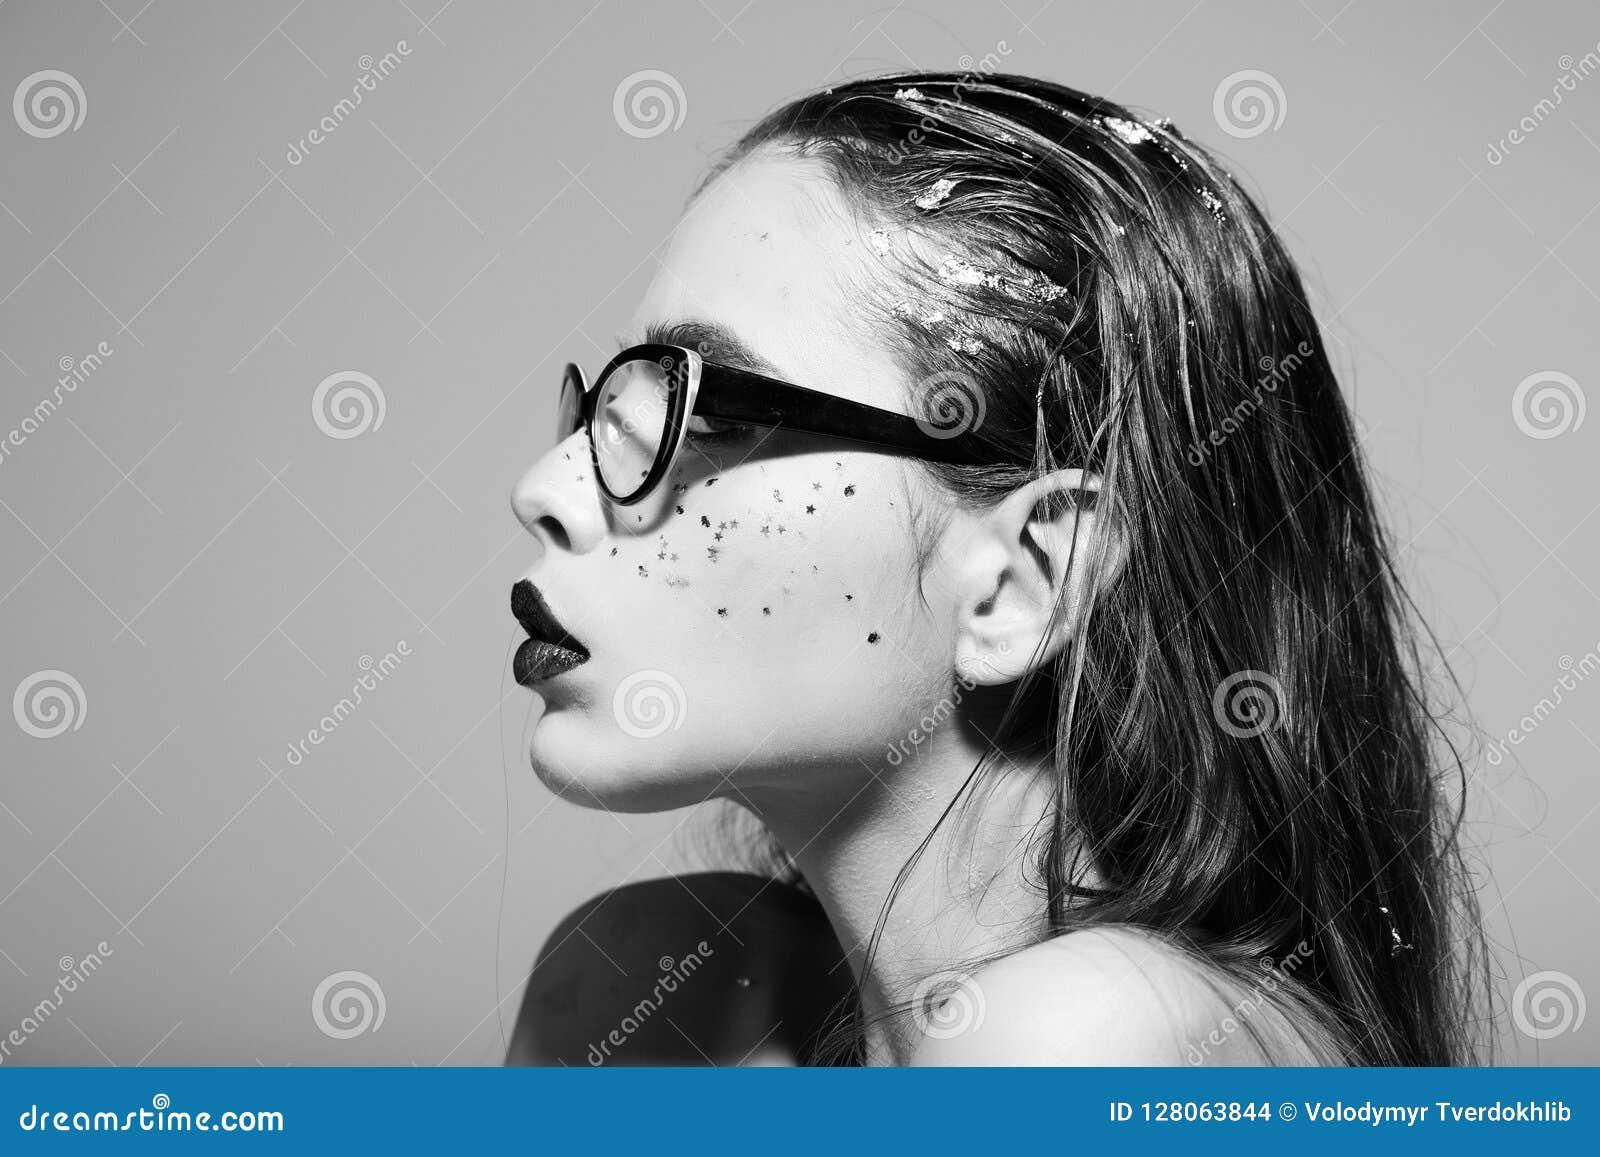 Woman with fashion makeup wearing eyeglasses